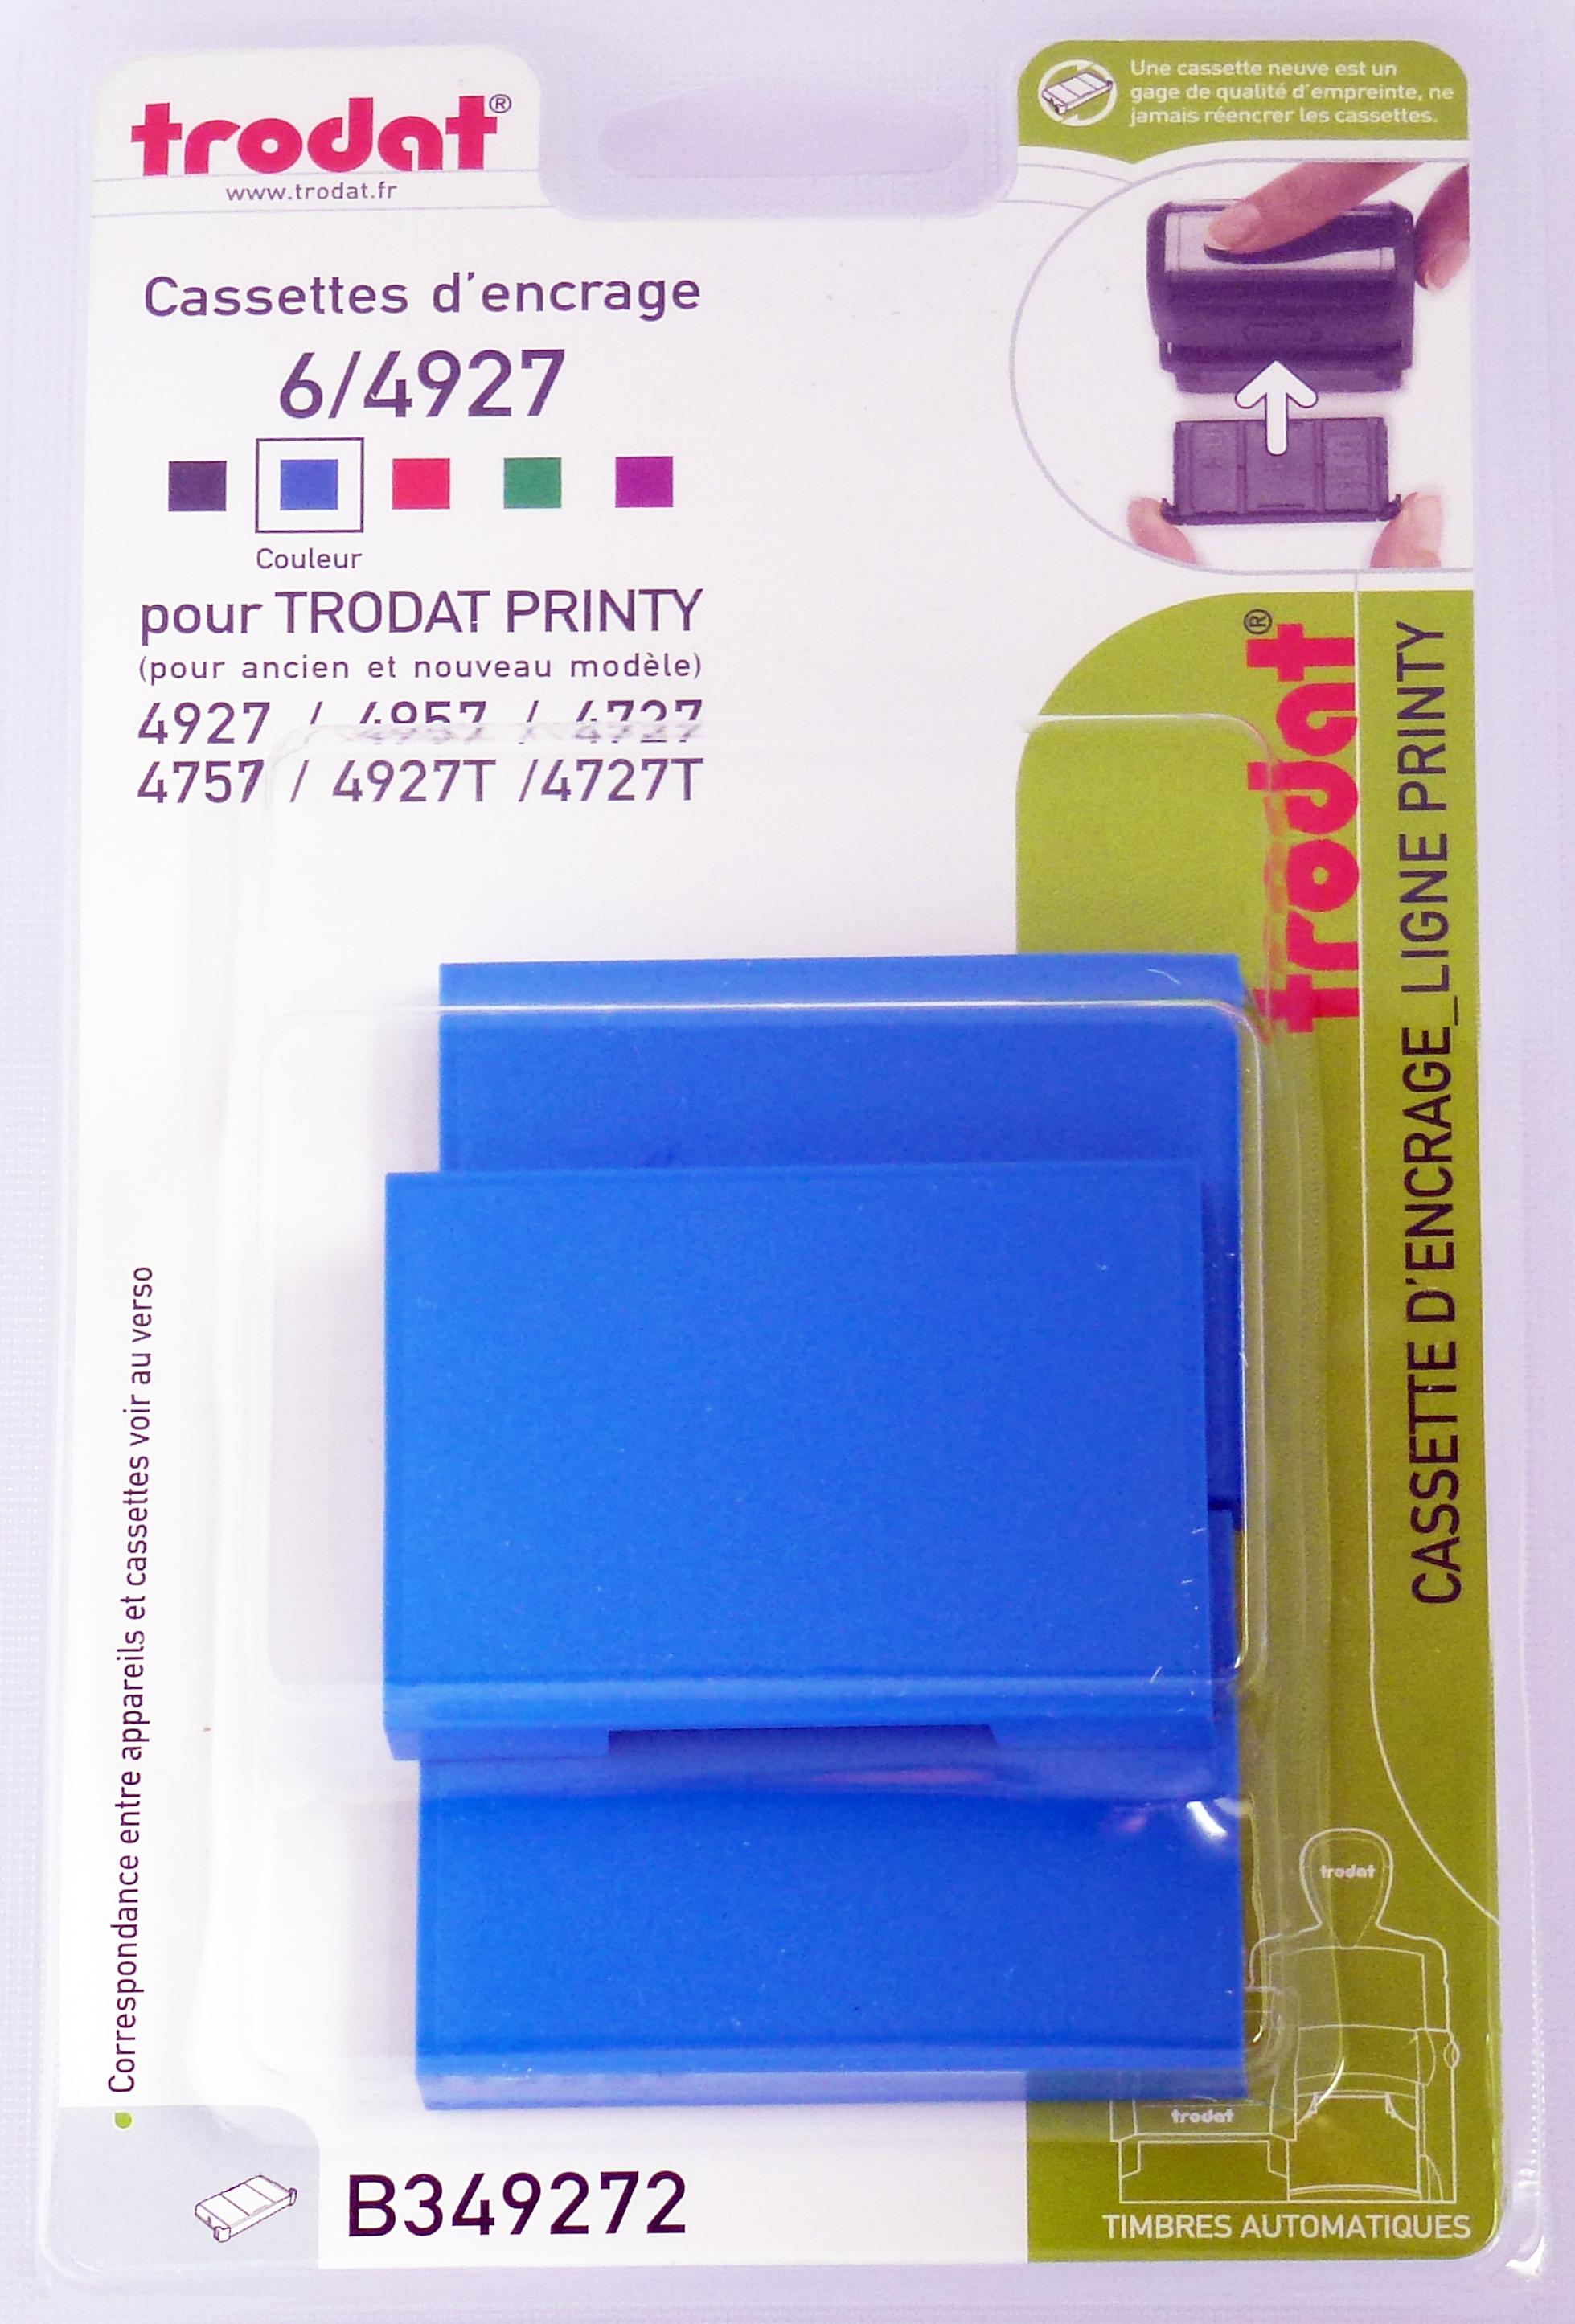 Trodat - 3 Encriers 6/4927 recharges pour tampon Printy 4927/4727/4957 - bleu